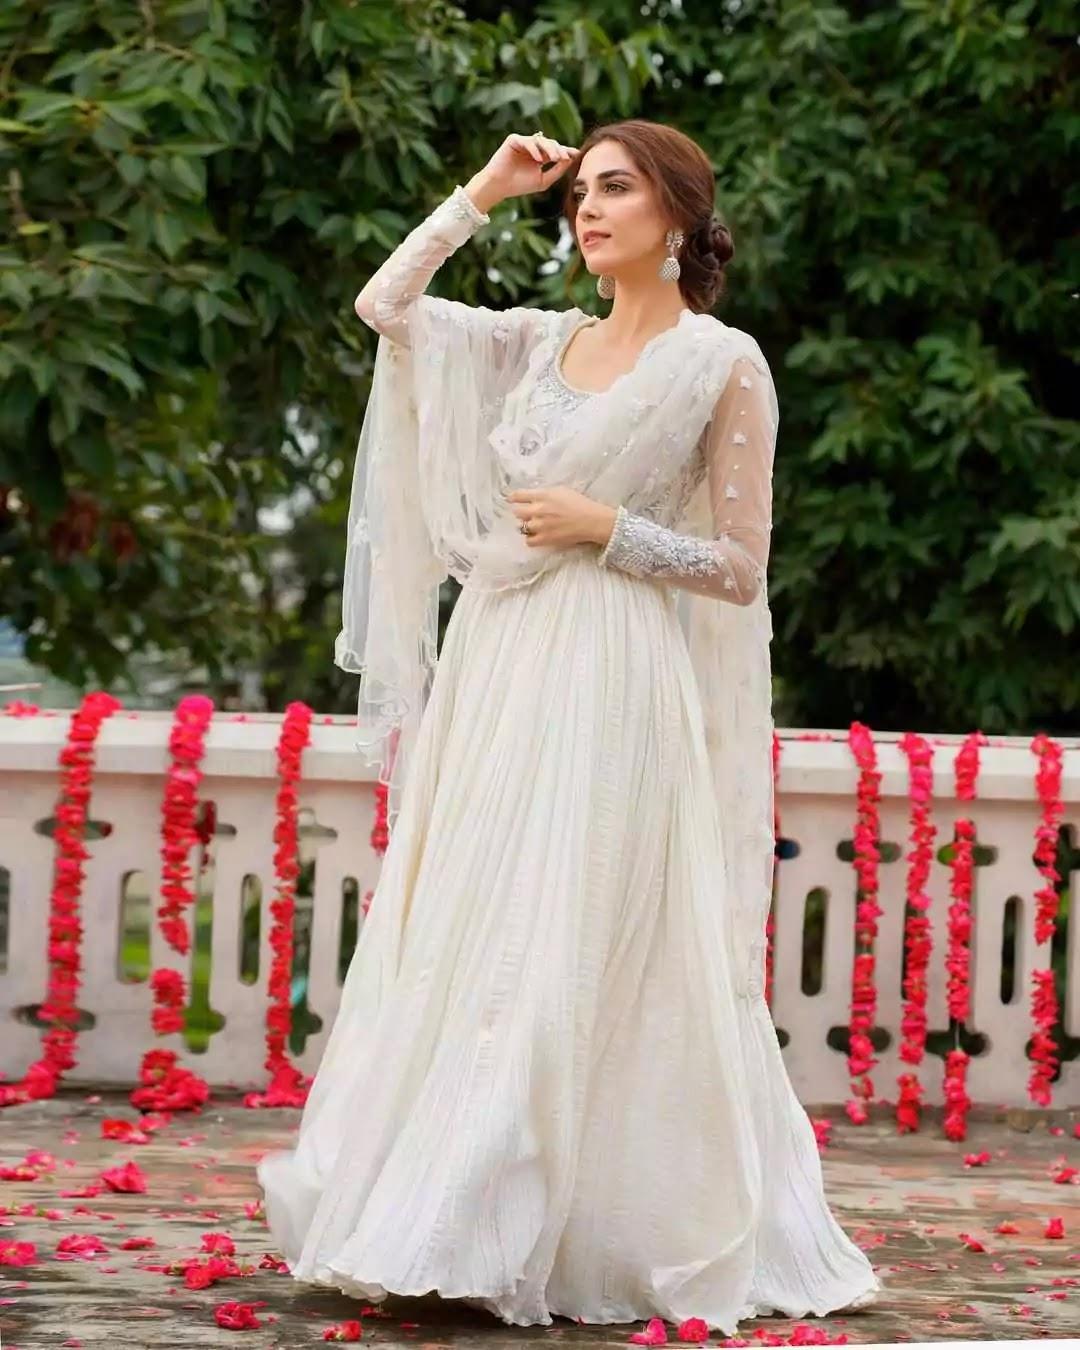 Beautiful Pictures of Maya Ali Wearing White Dress